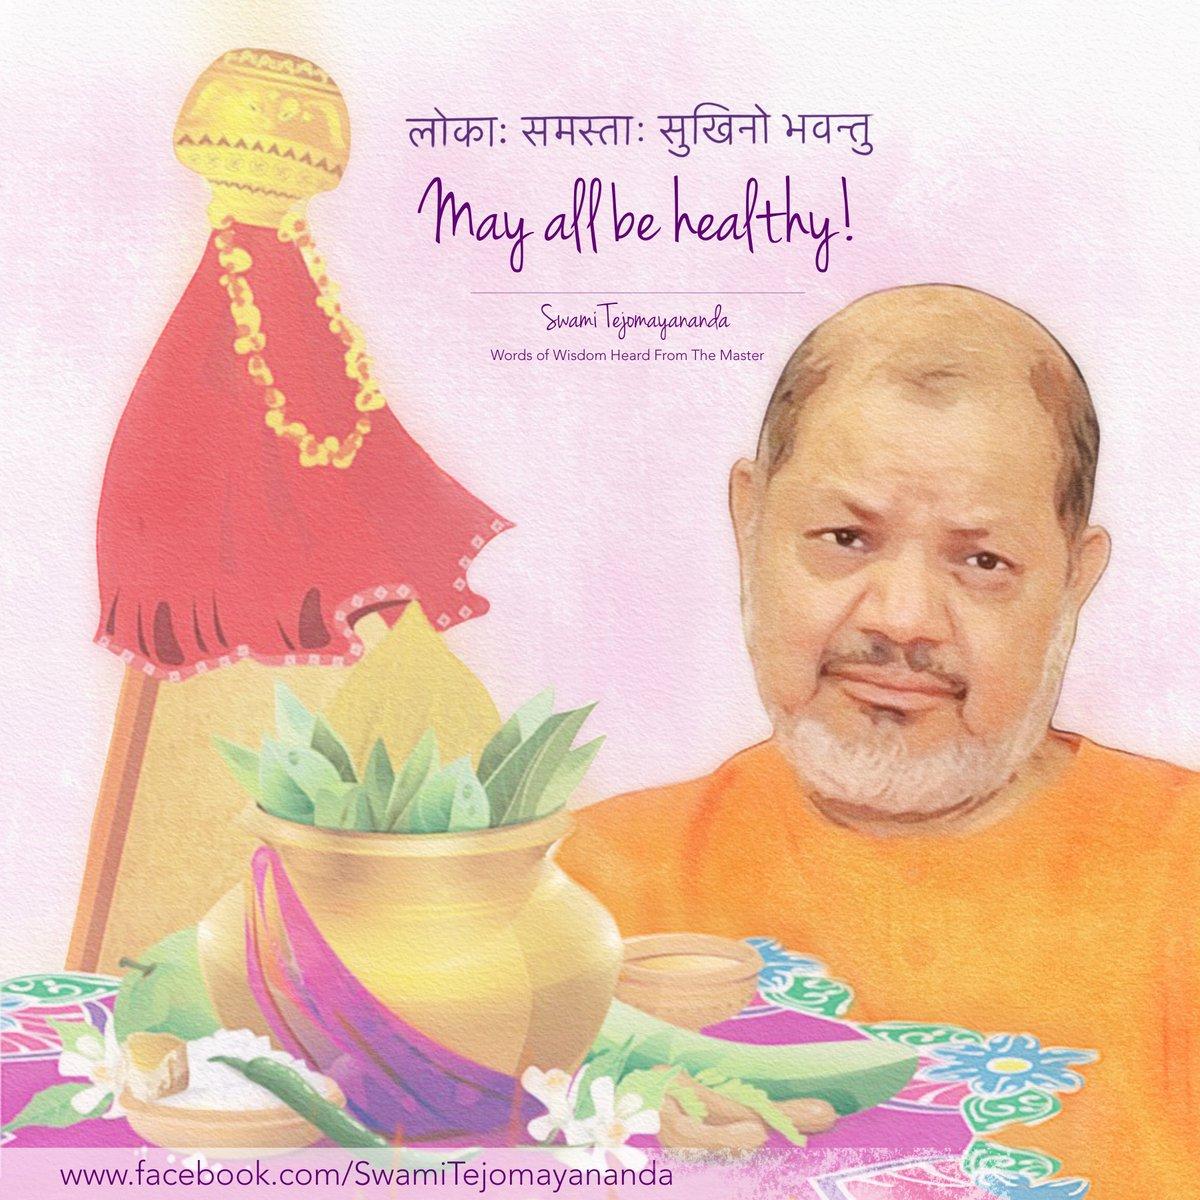 #WordsOfWisdomHeardFromTheMaster #SwamiTejomayananda लोकाः समस्ताः सुखिनो भवन्तु May All Be #Healthy! #HappyUgadi #HappyGudiPadwa #StayHomeStaySafe